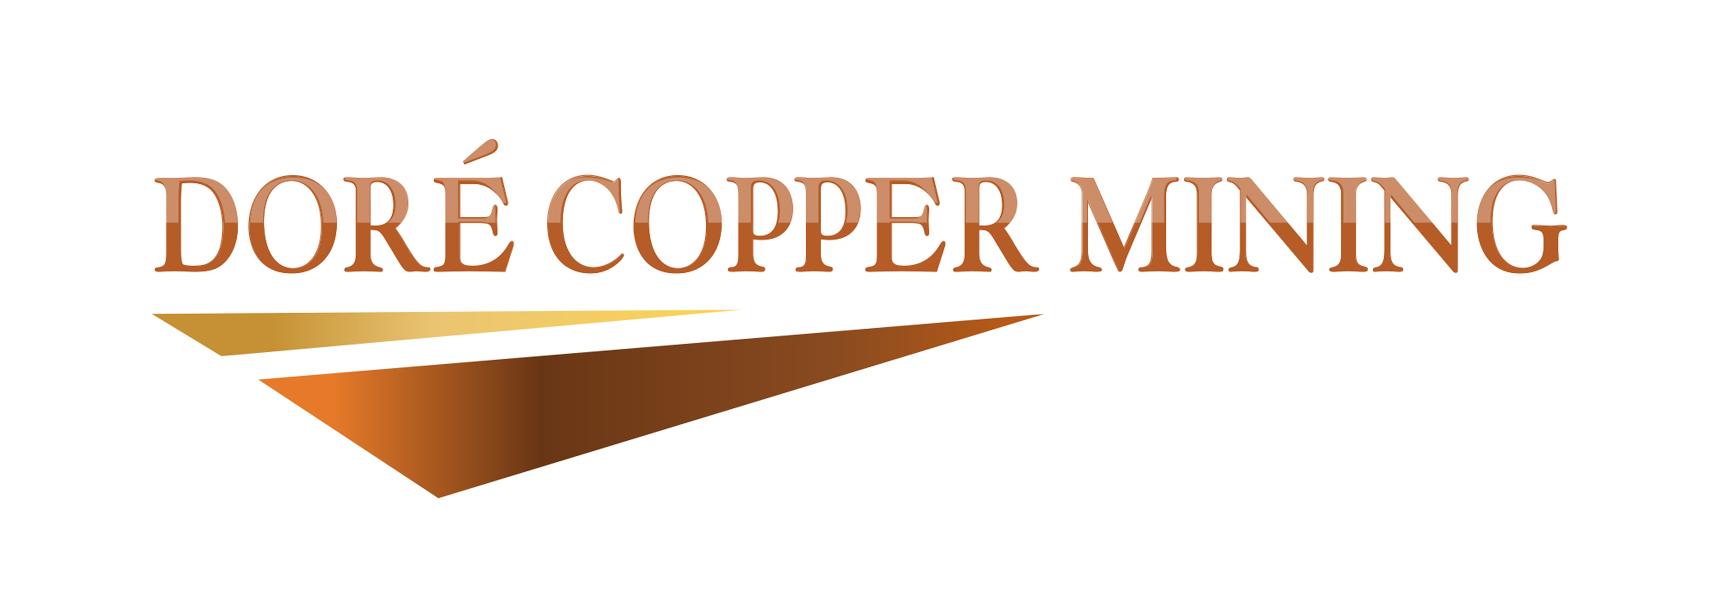 Doré Copper Announces its Preparation Plans to Dewater the Former Joe Mann Gold Mine and Cedar Bay Copper-Gold Mine